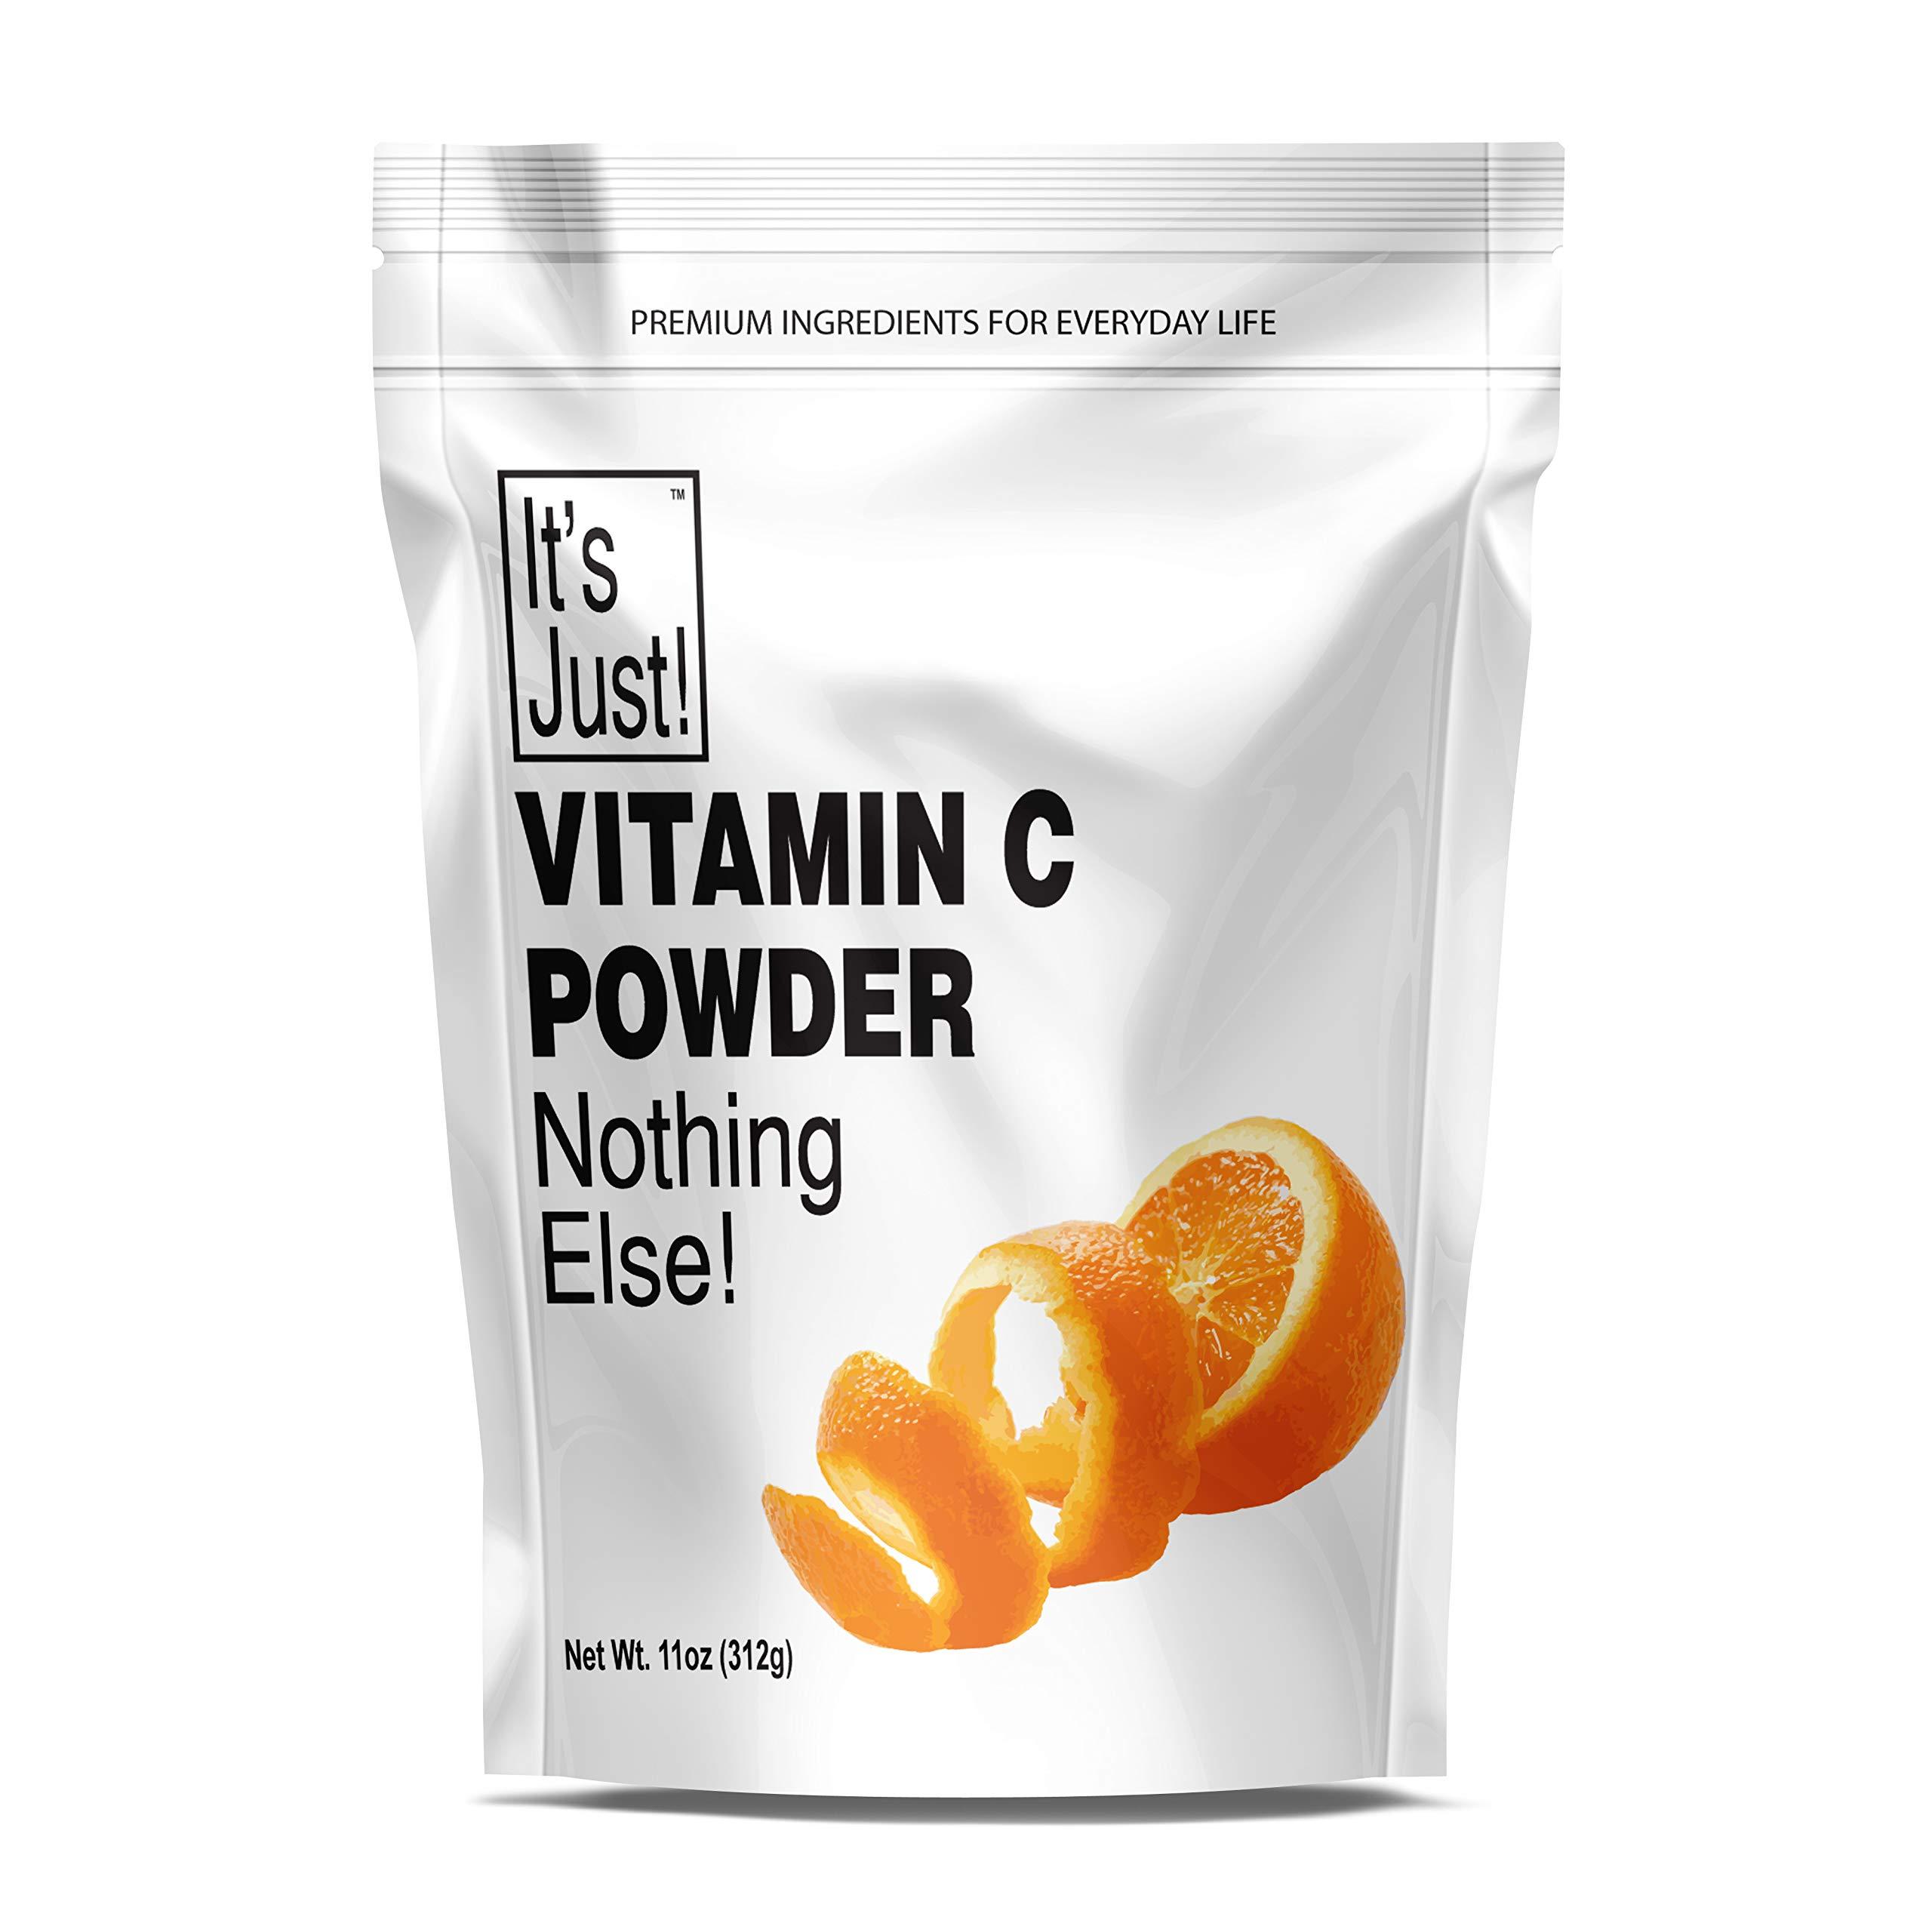 It's Just - Vitamin C Powder, 100% Pure Ascorbic Acid, Food Grade, Immune Support, Homemade Cosmetics (11oz)